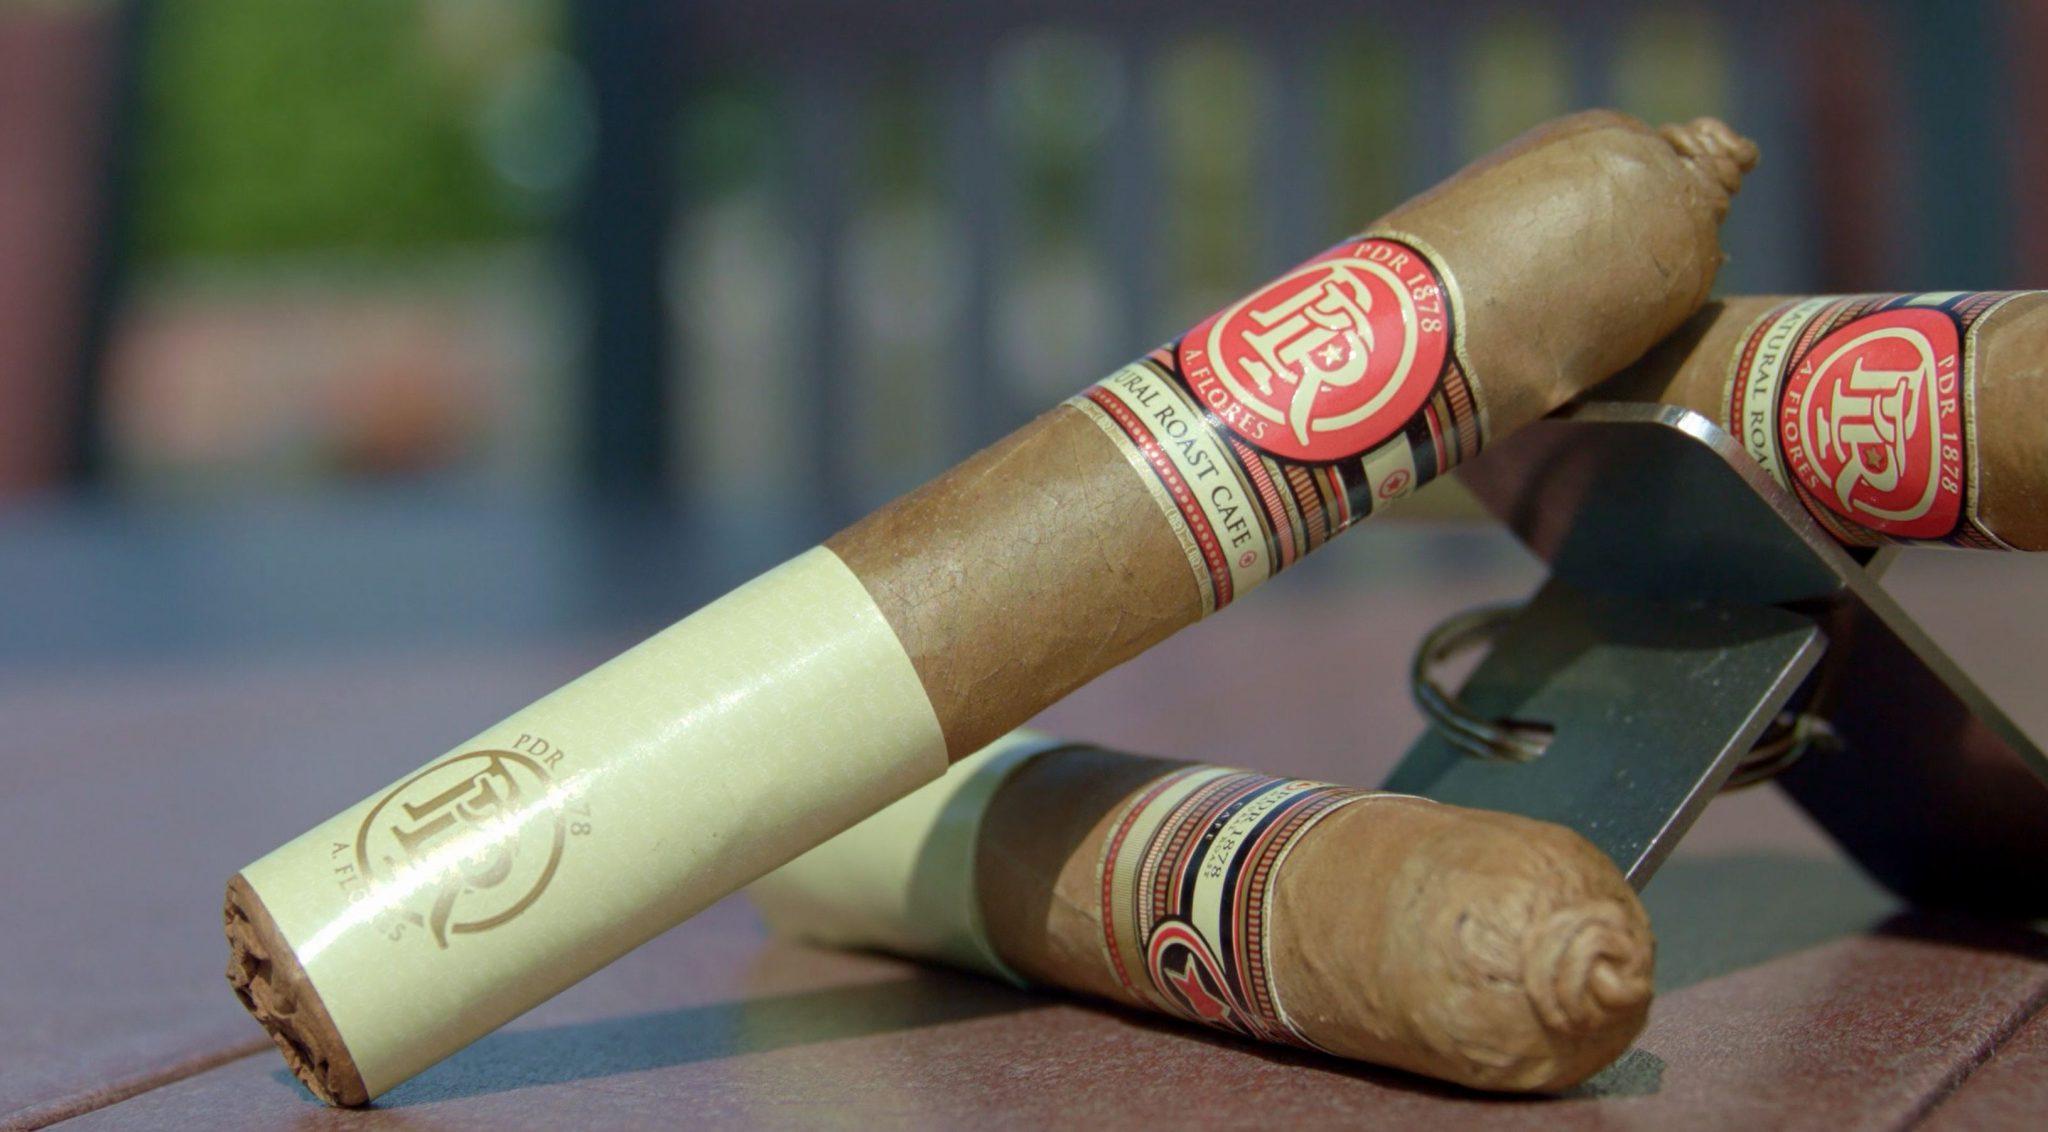 PDR cigars PDR 1878 Natural Roast Café Cigar Review at Famous Smoke Shop cigar setup 2